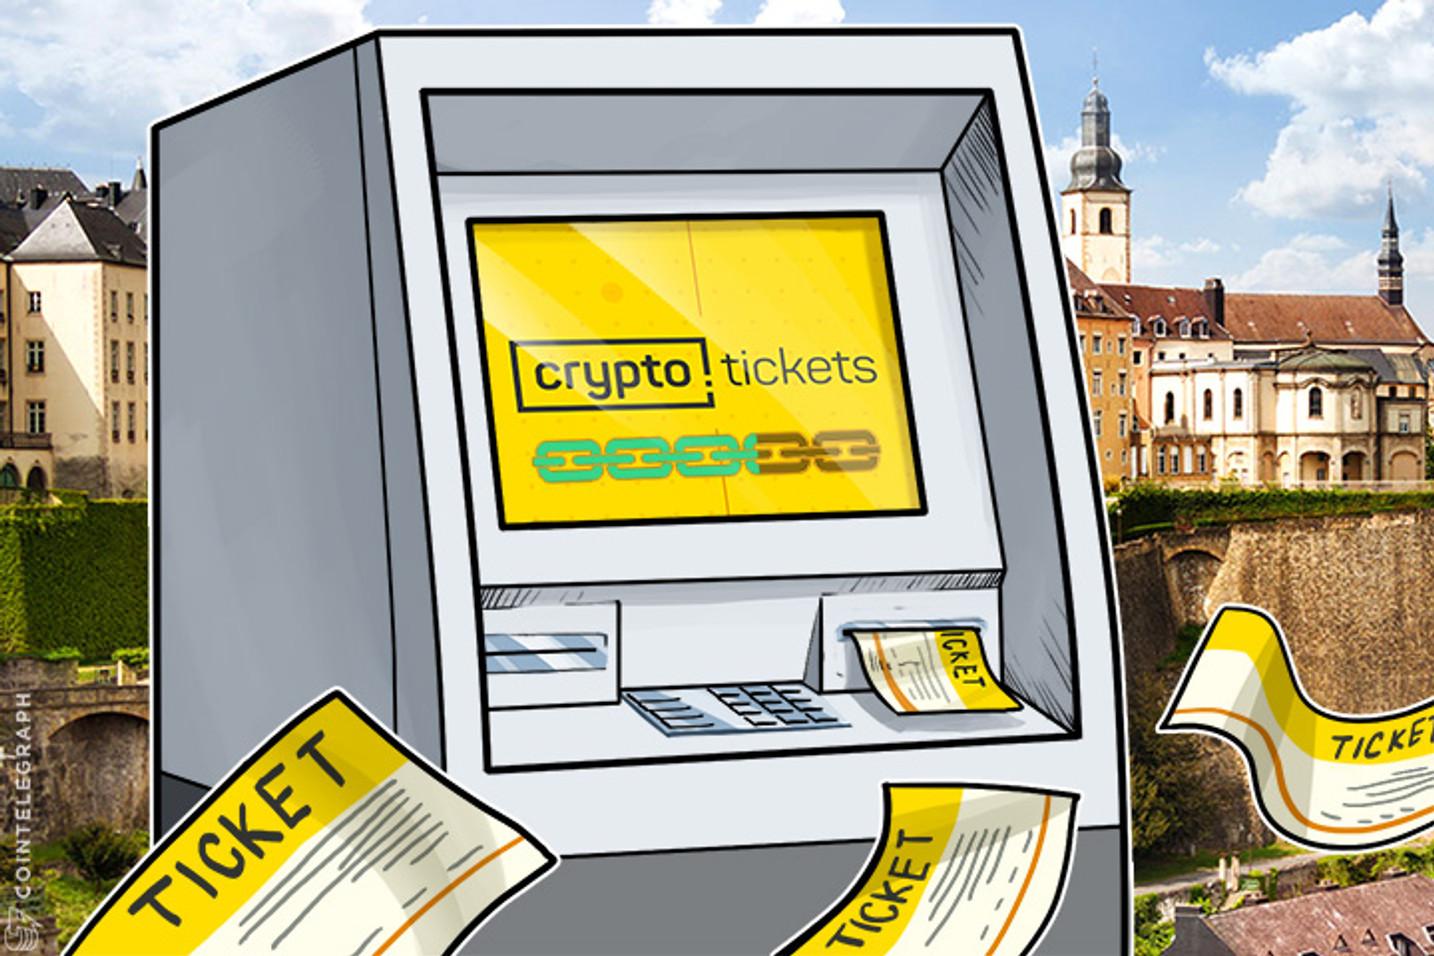 Why Ticketing Industry Needs Blockchain